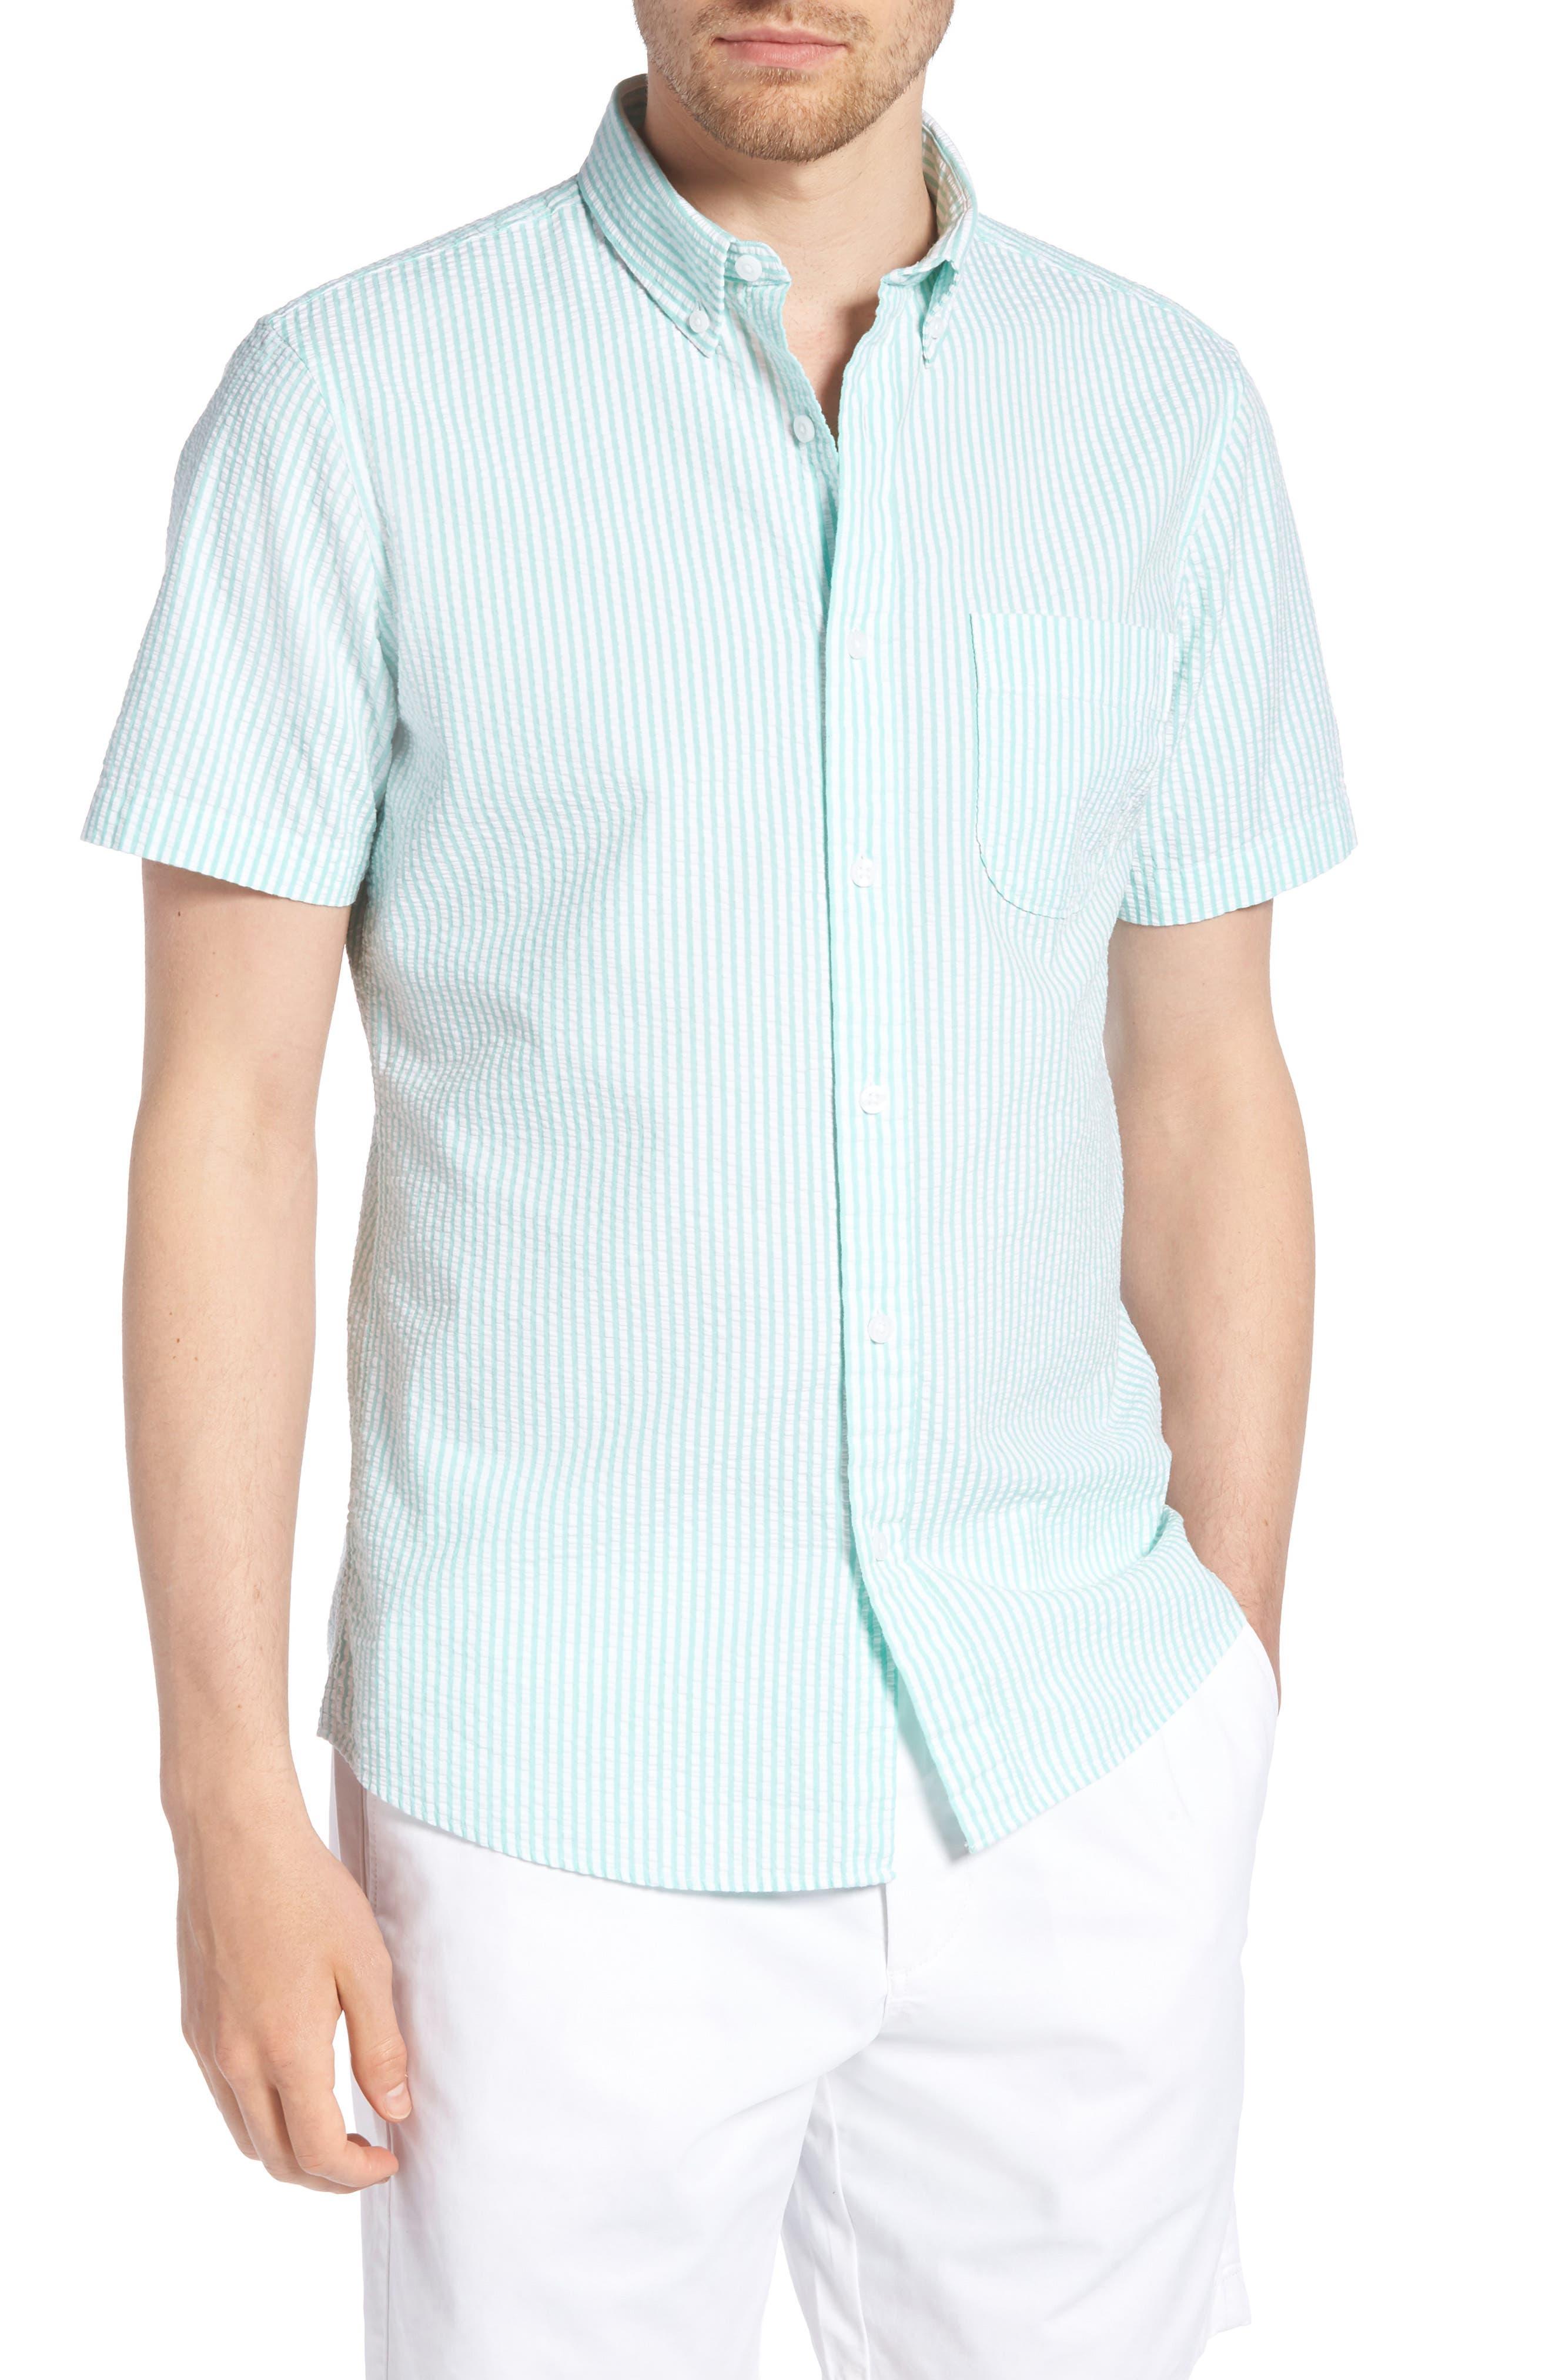 Trim Fit Seersucker Short Sleeve Sport Shirt,                             Main thumbnail 1, color,                             White Green Seersucker Stripe